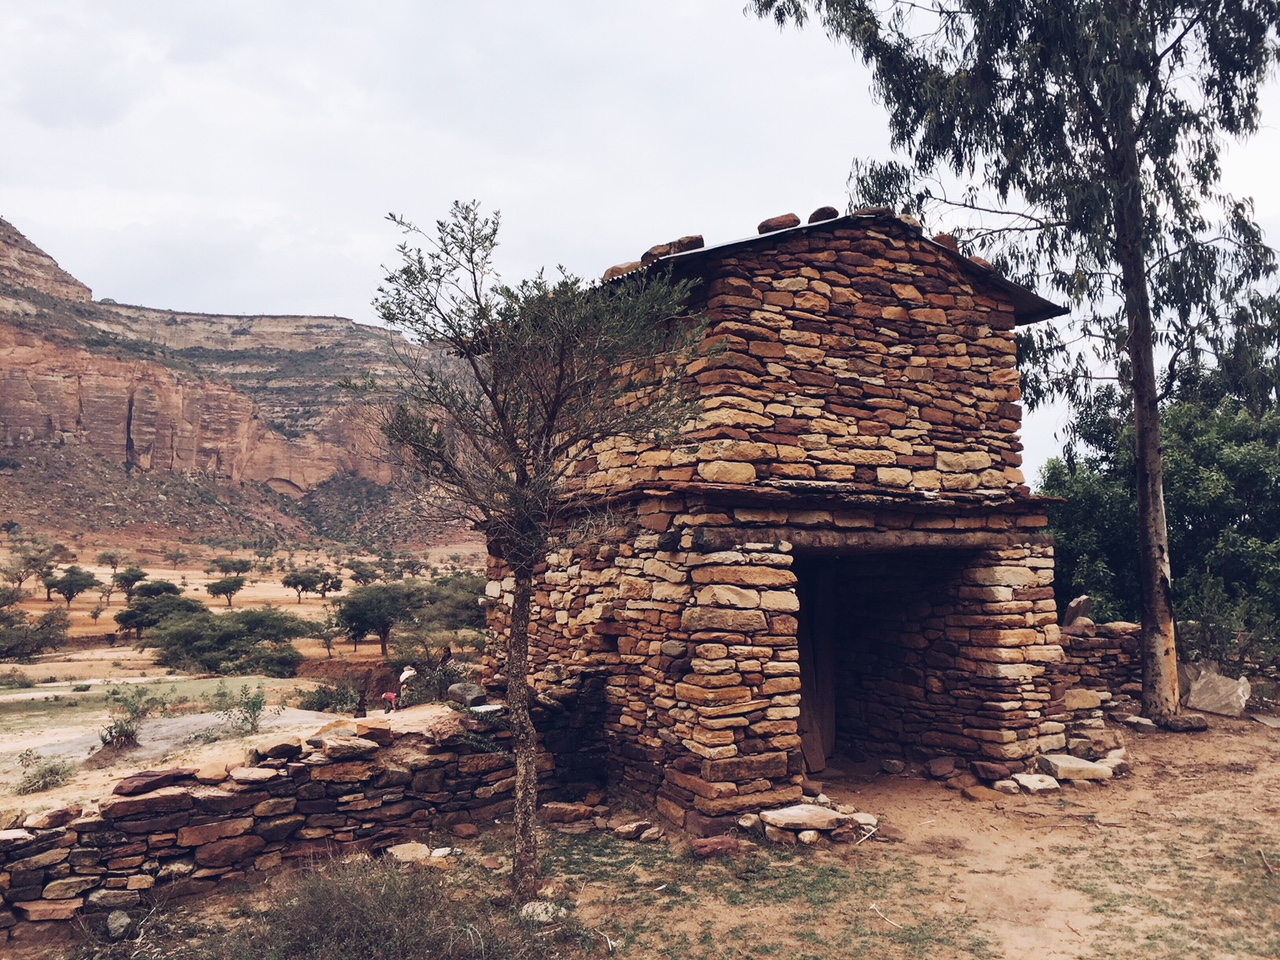 Maryam-Papasetti-Gheralta-Ethiopa-church